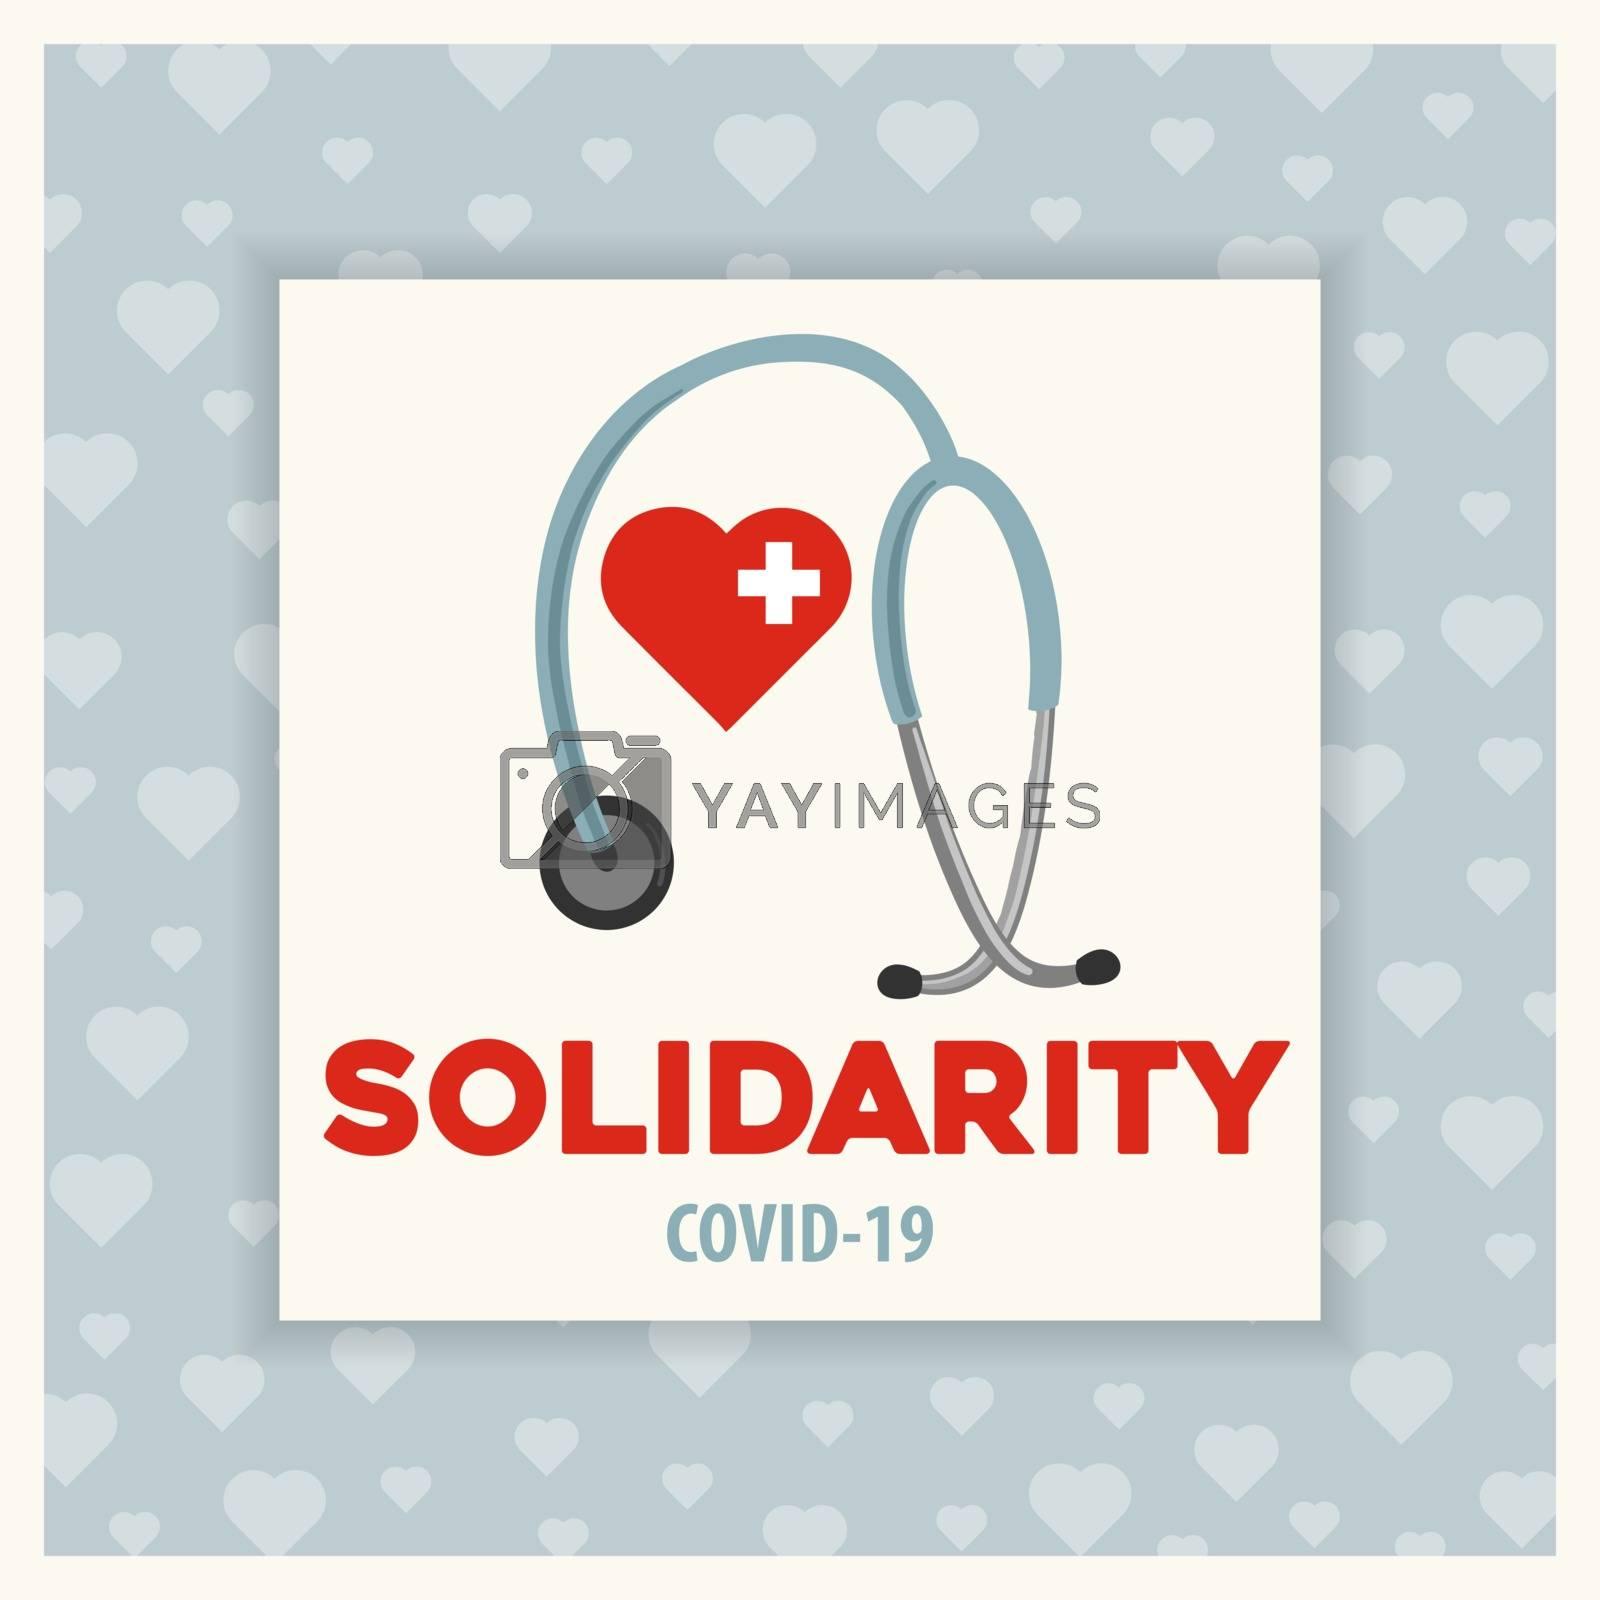 Solidarity with doctors. Coronavirus poster. Covid-19 solidarity by balasoiu